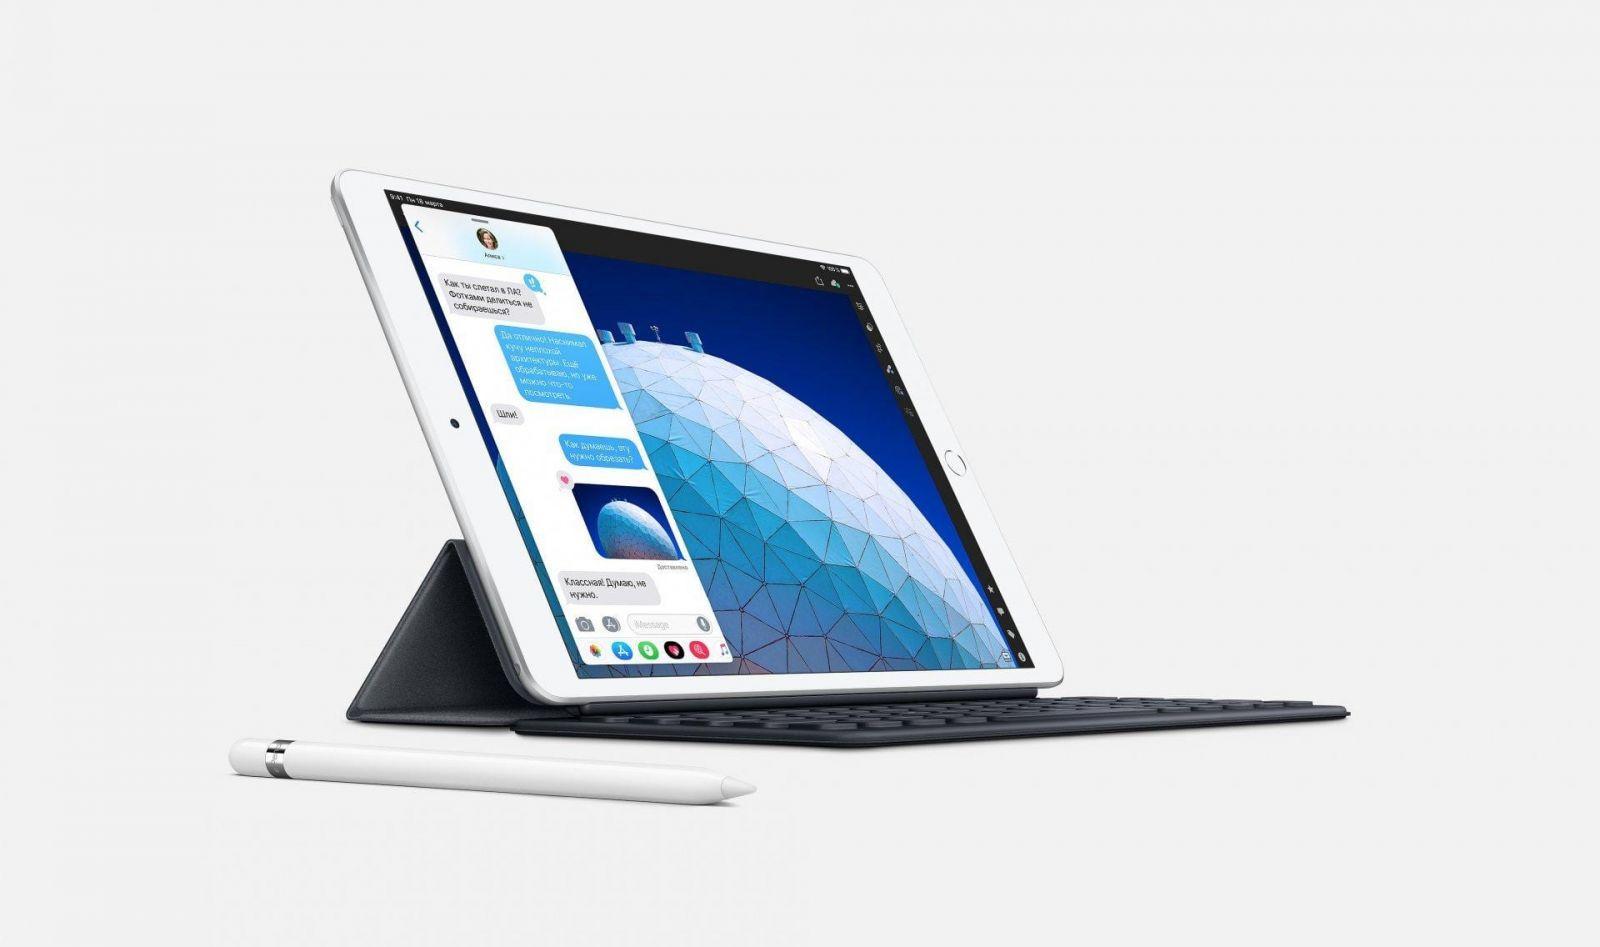 Apple неожиданно представила новый iPad Air и iPad mini c процессором A12